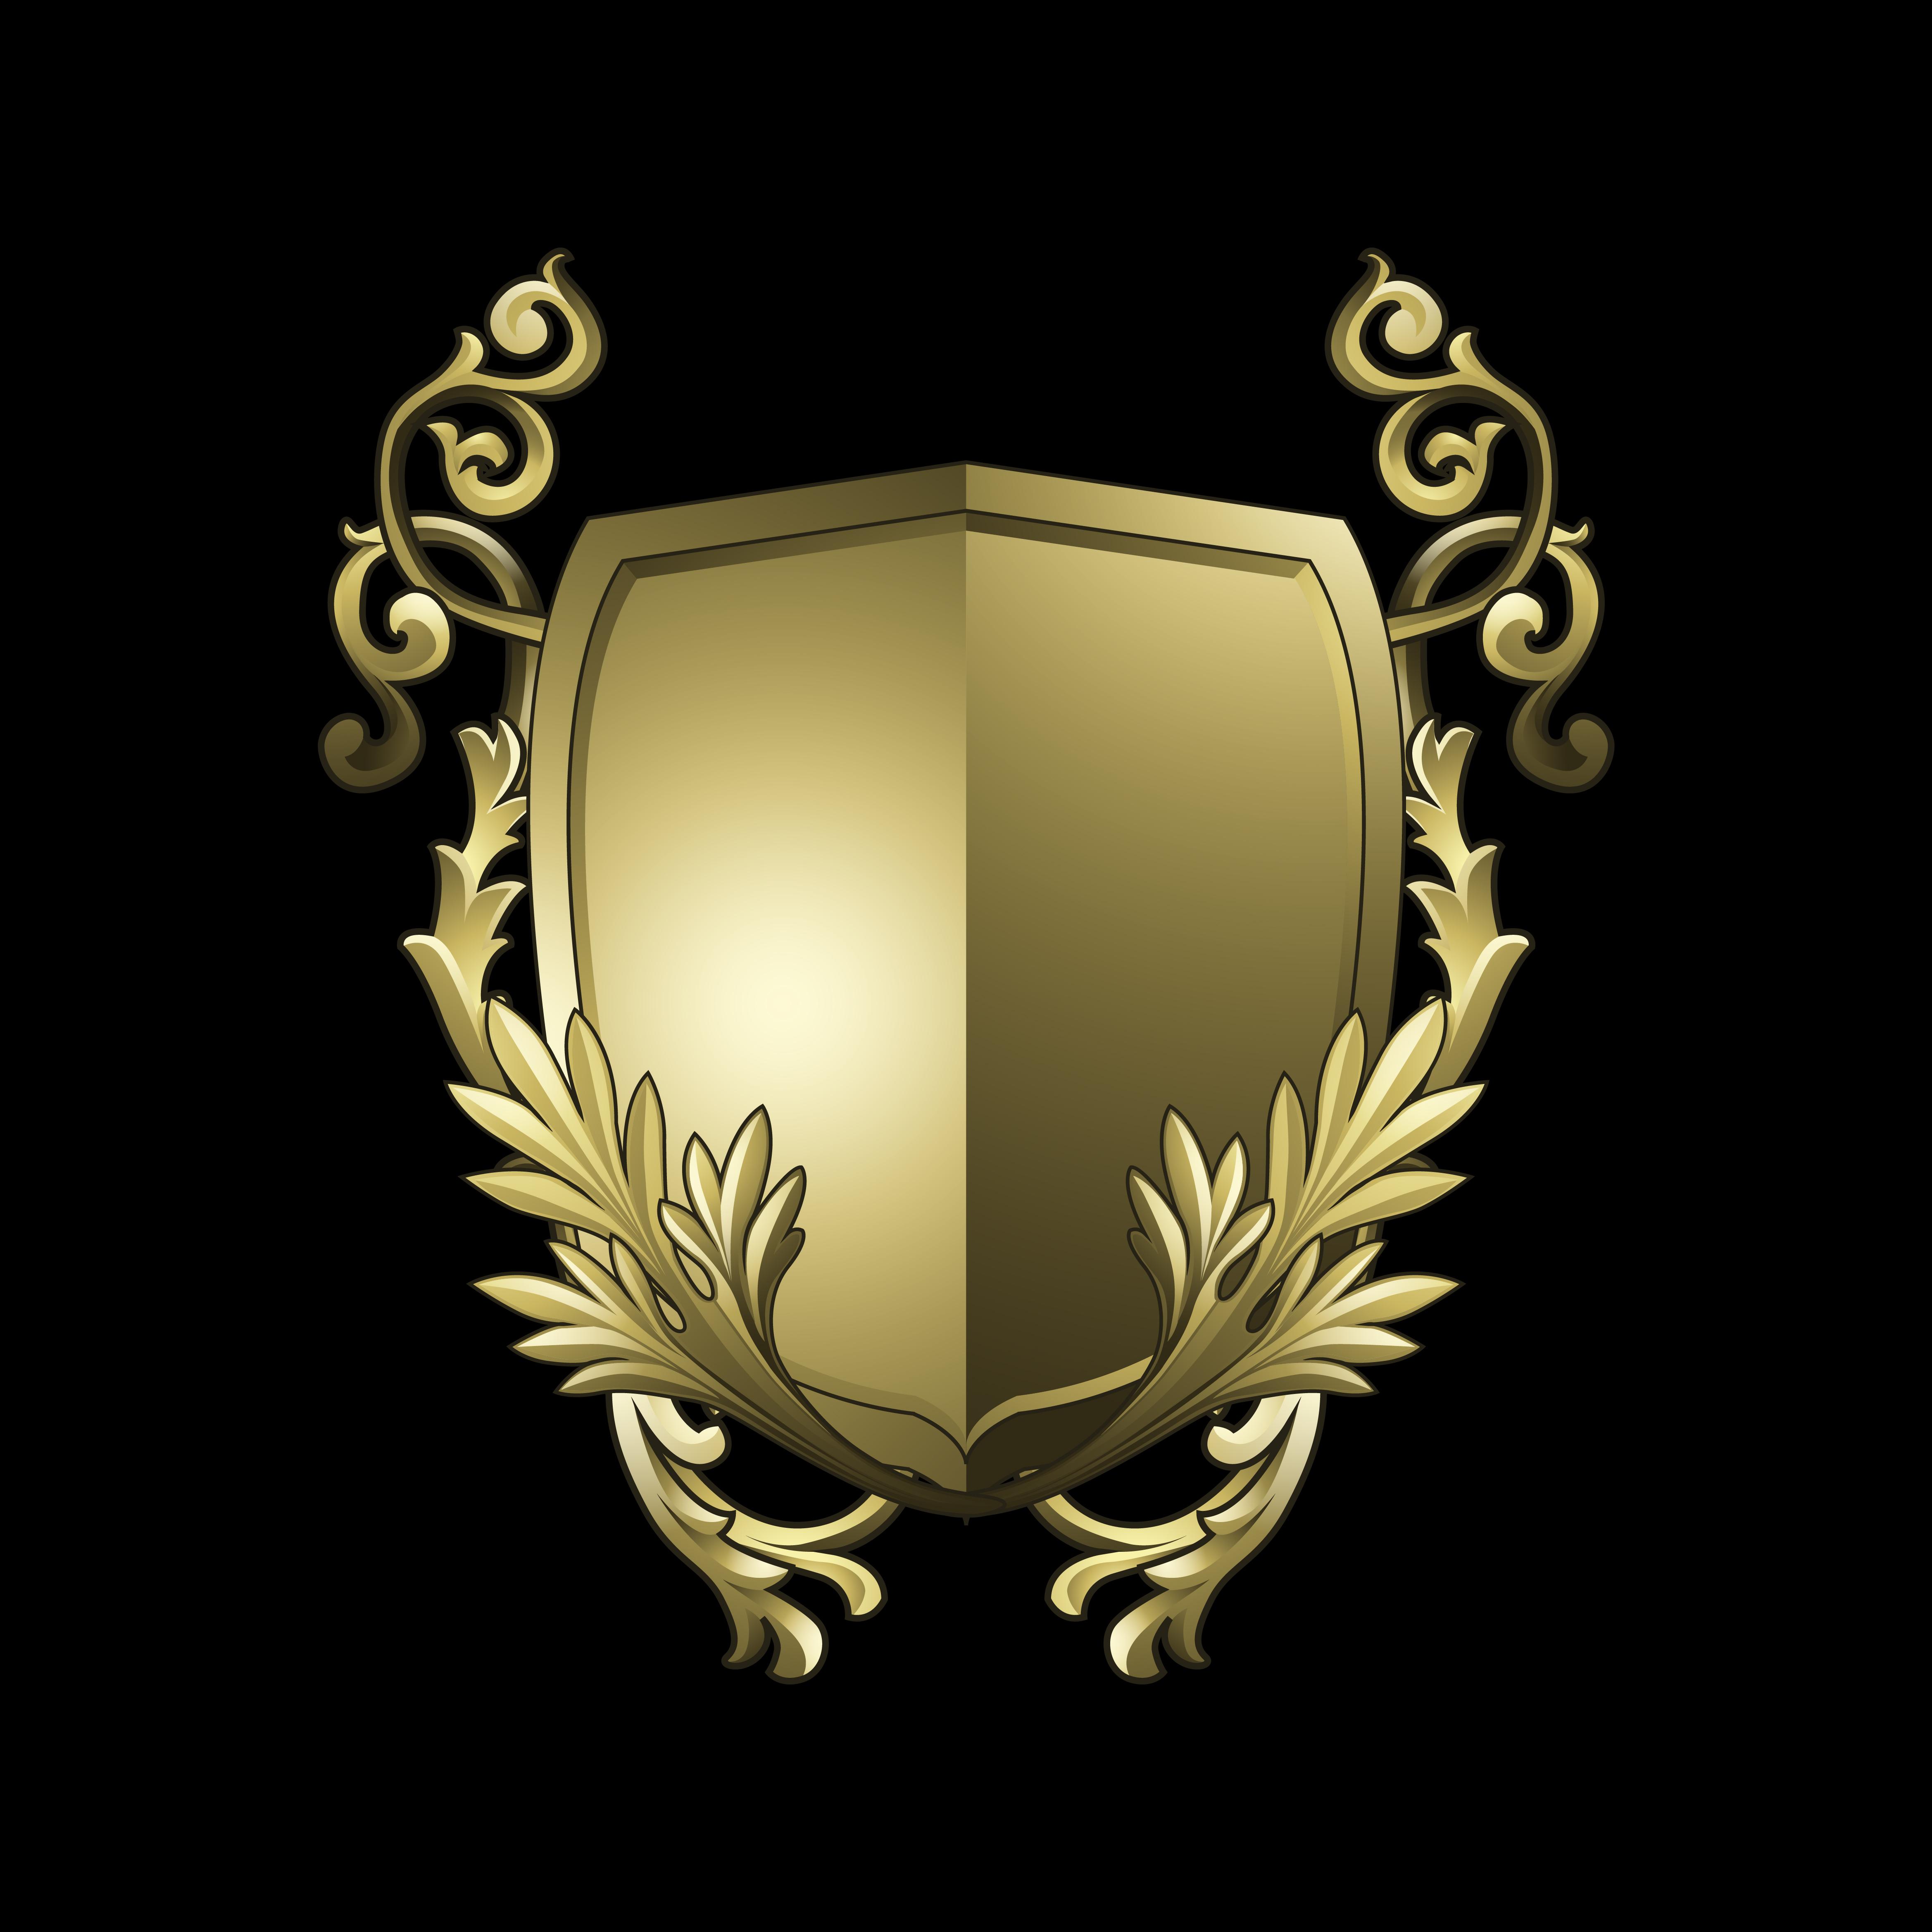 Black Baroque Shield Elements Vector: Golden Baroque Shield Elements Vector